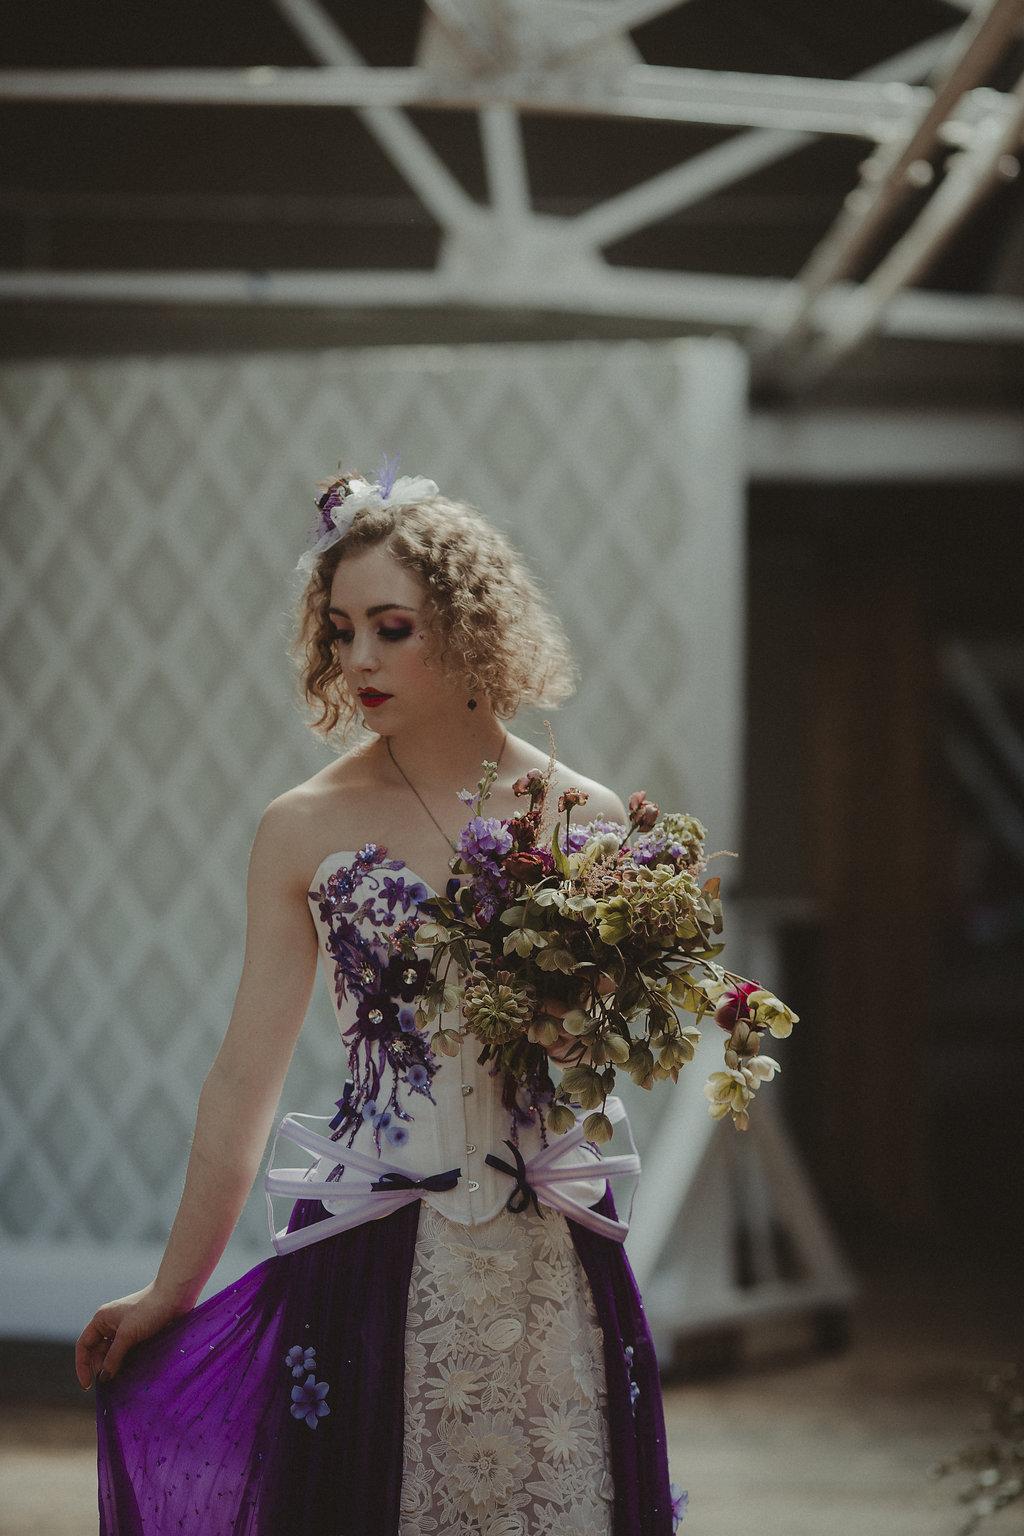 Studio Fotografico Bacci - Steampunk wedding - alternative wedding 27